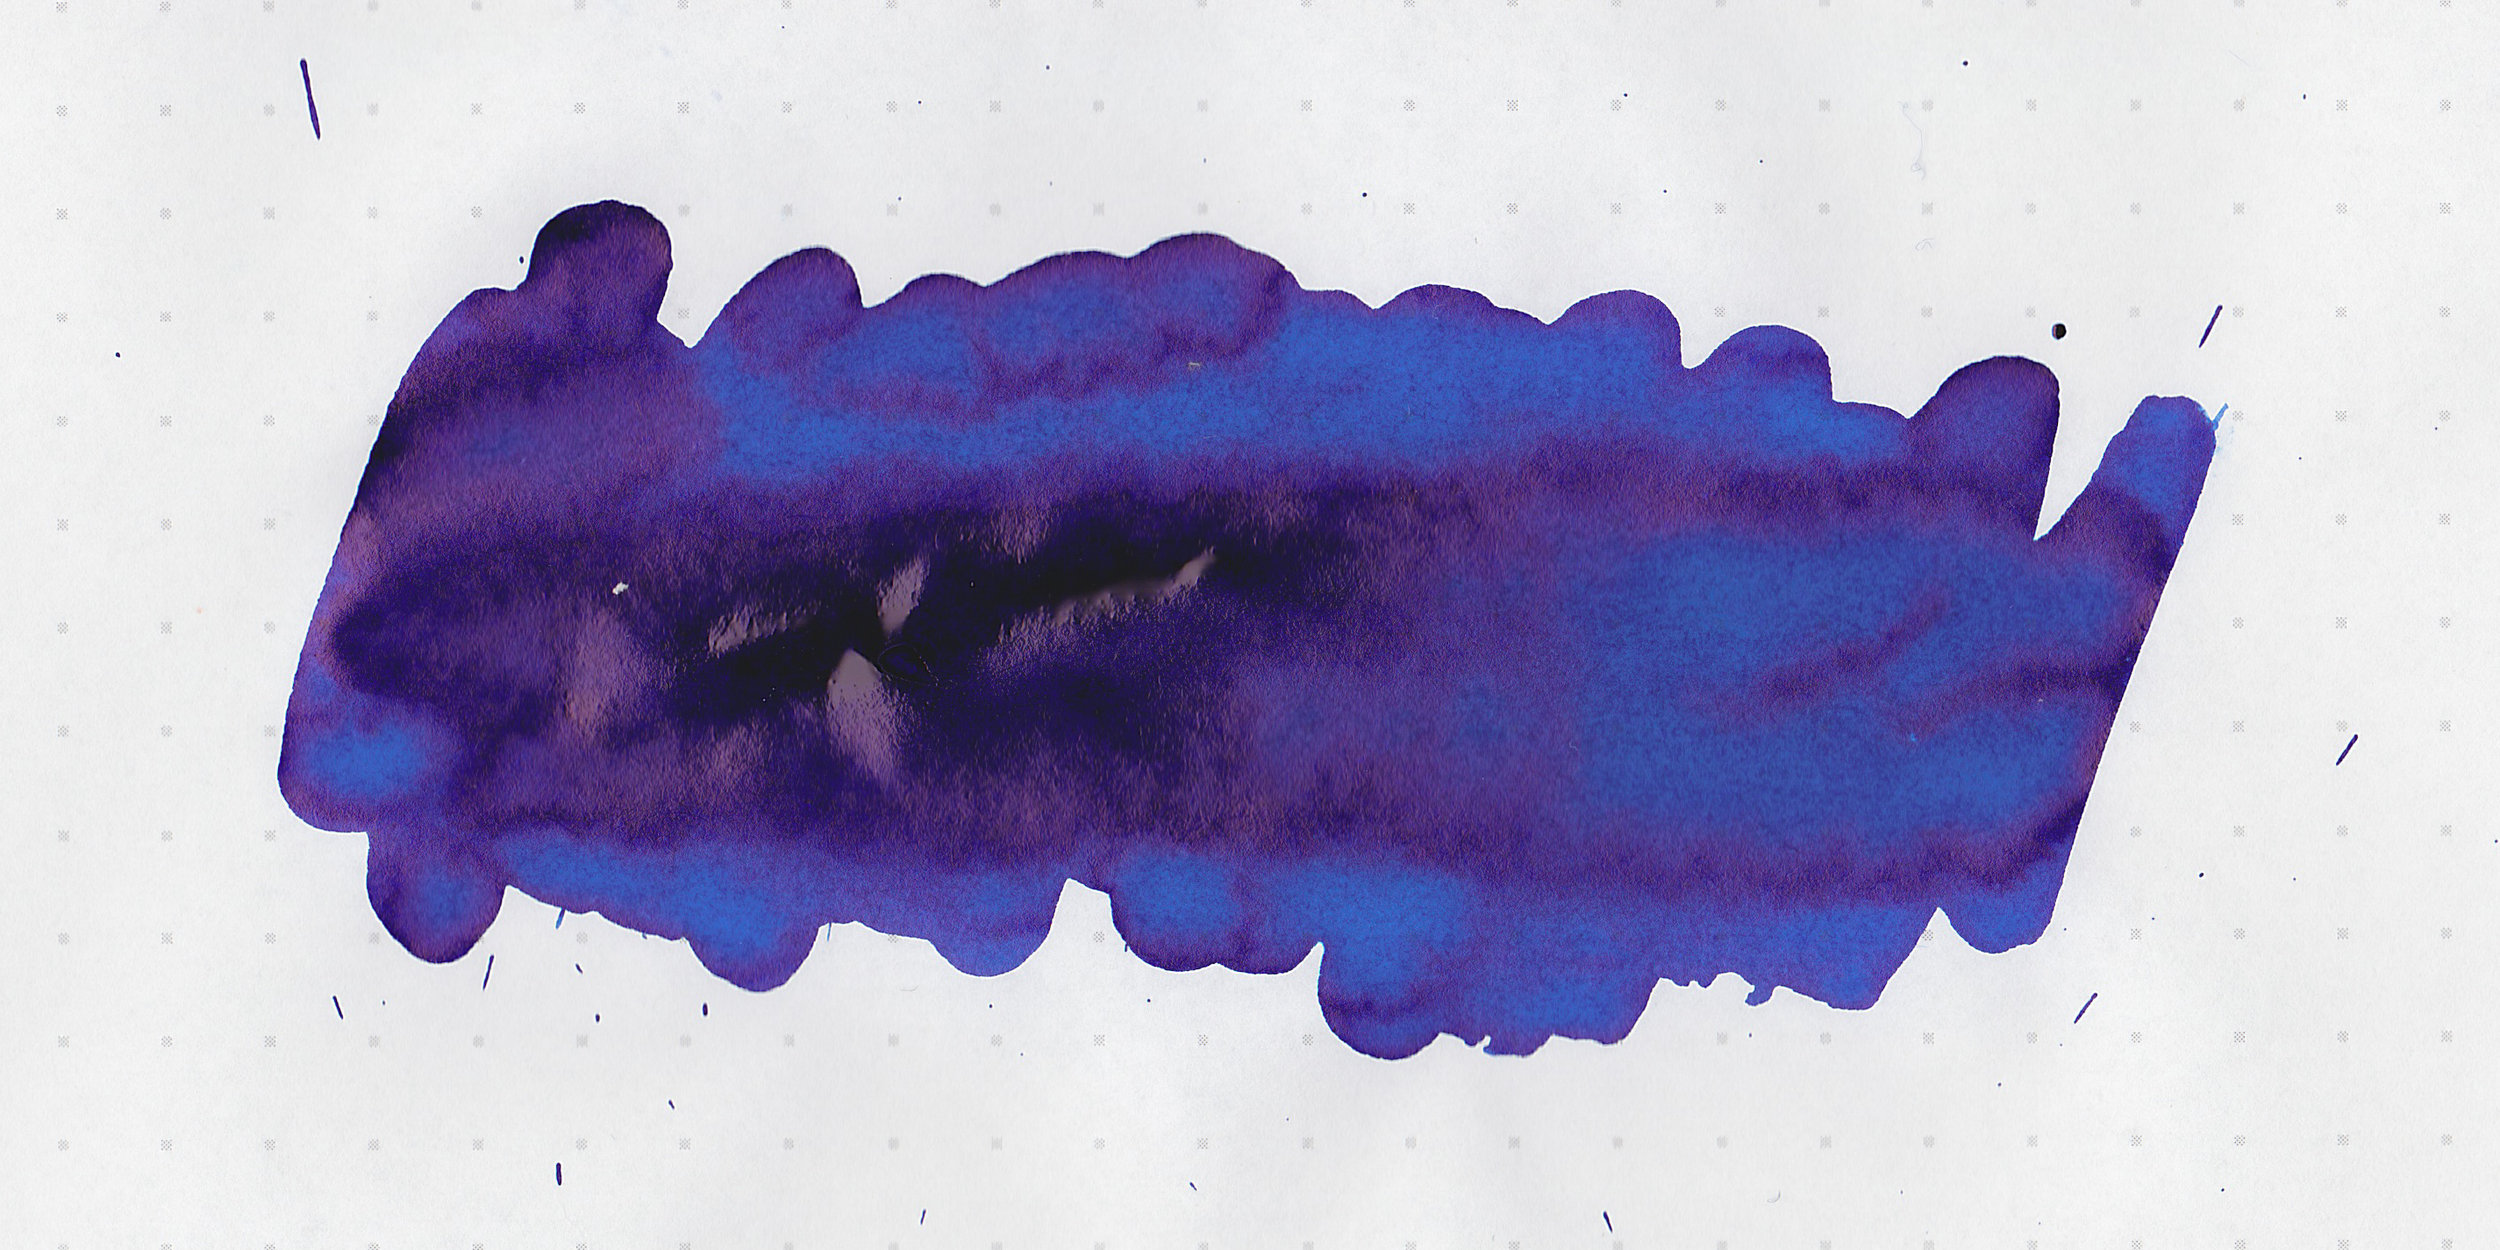 kwz-azure-3-12.jpg